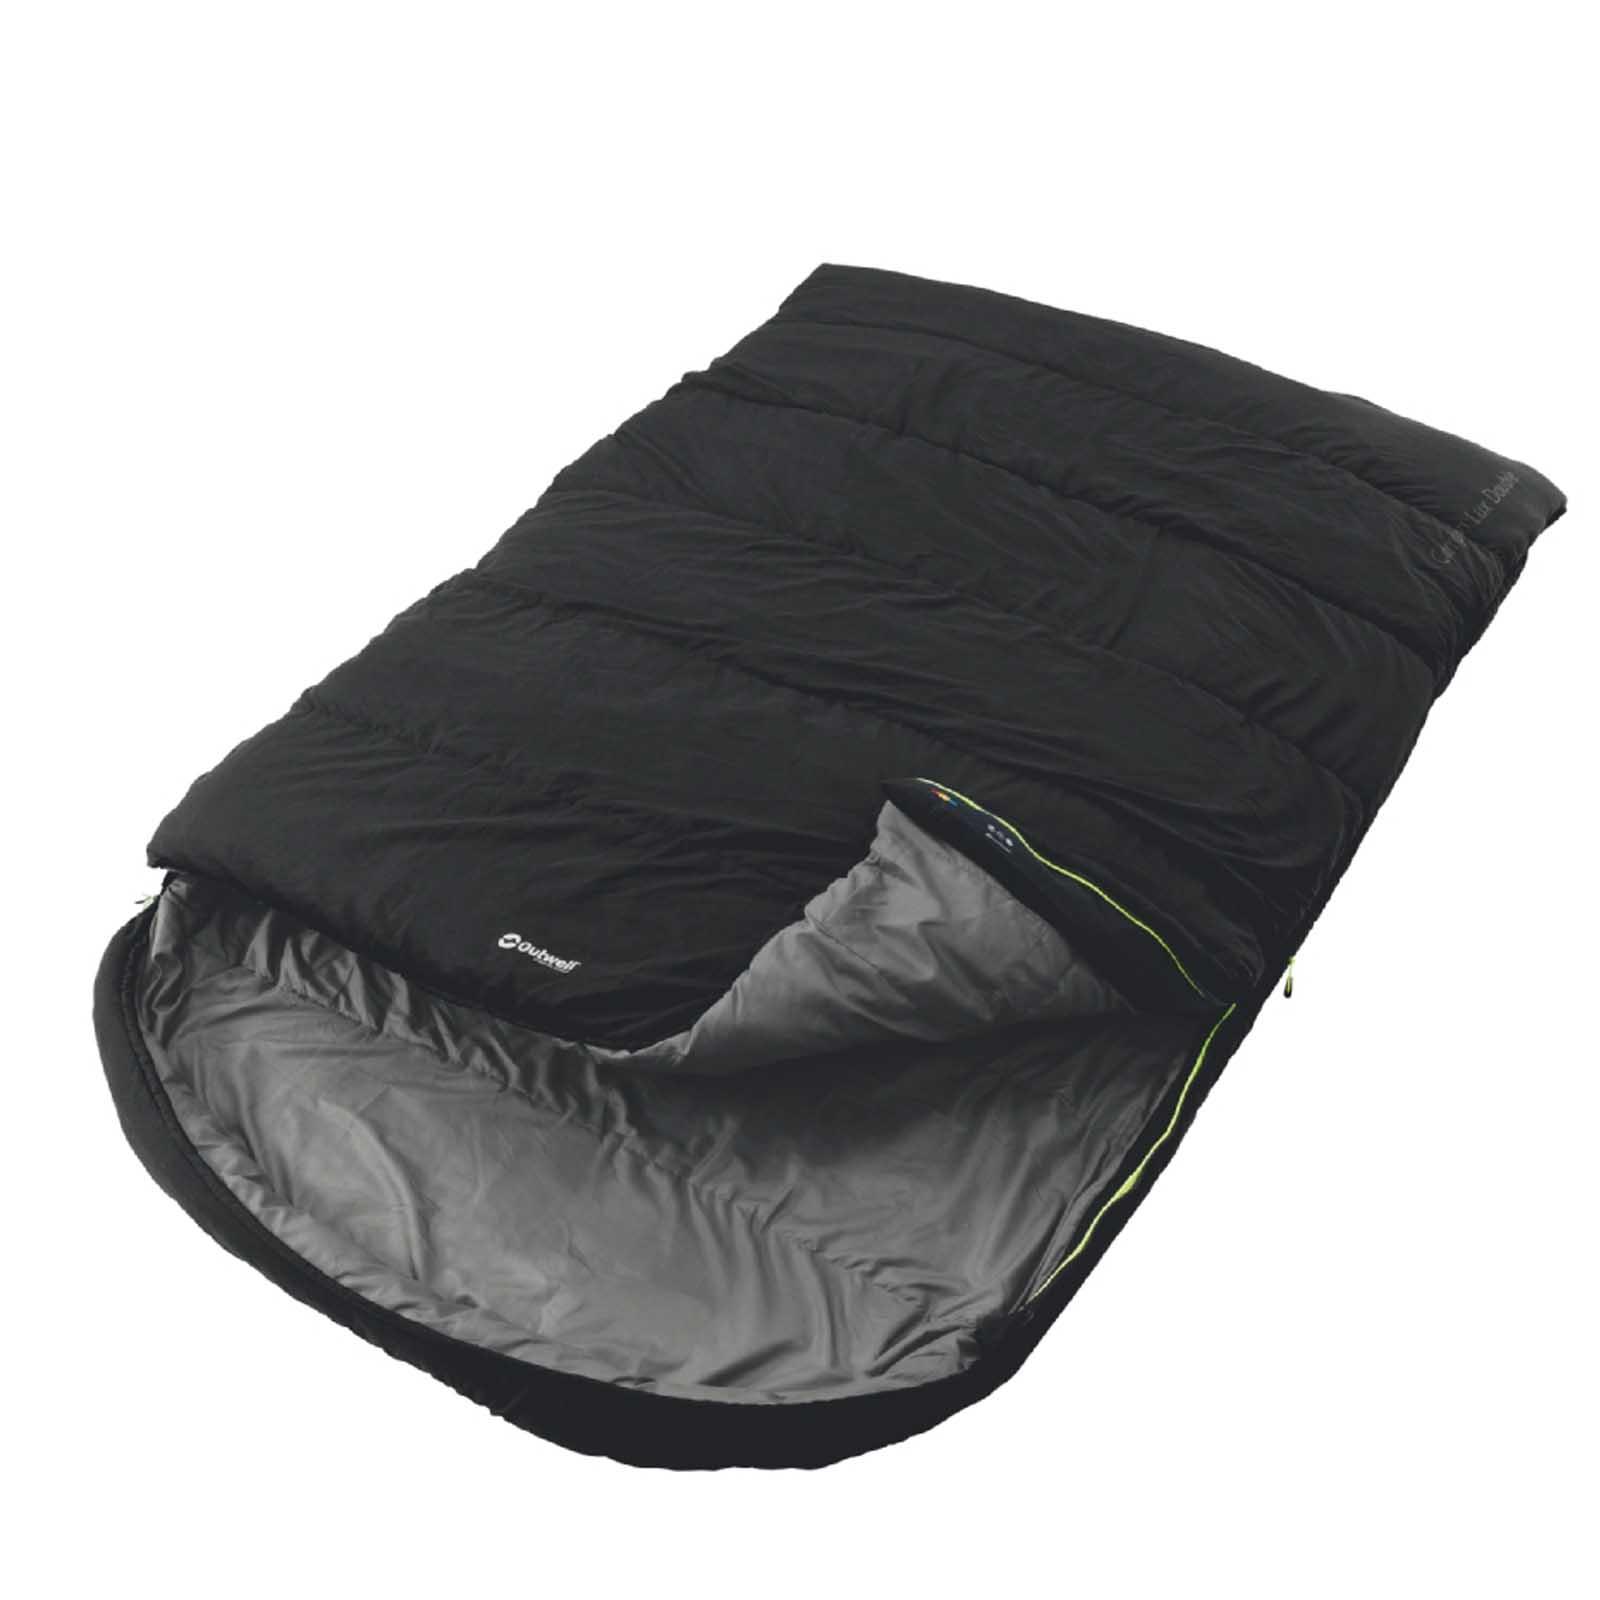 doppel deckenschlafsack outwell campion lux schwarz camping outdoor schlafsack ebay. Black Bedroom Furniture Sets. Home Design Ideas